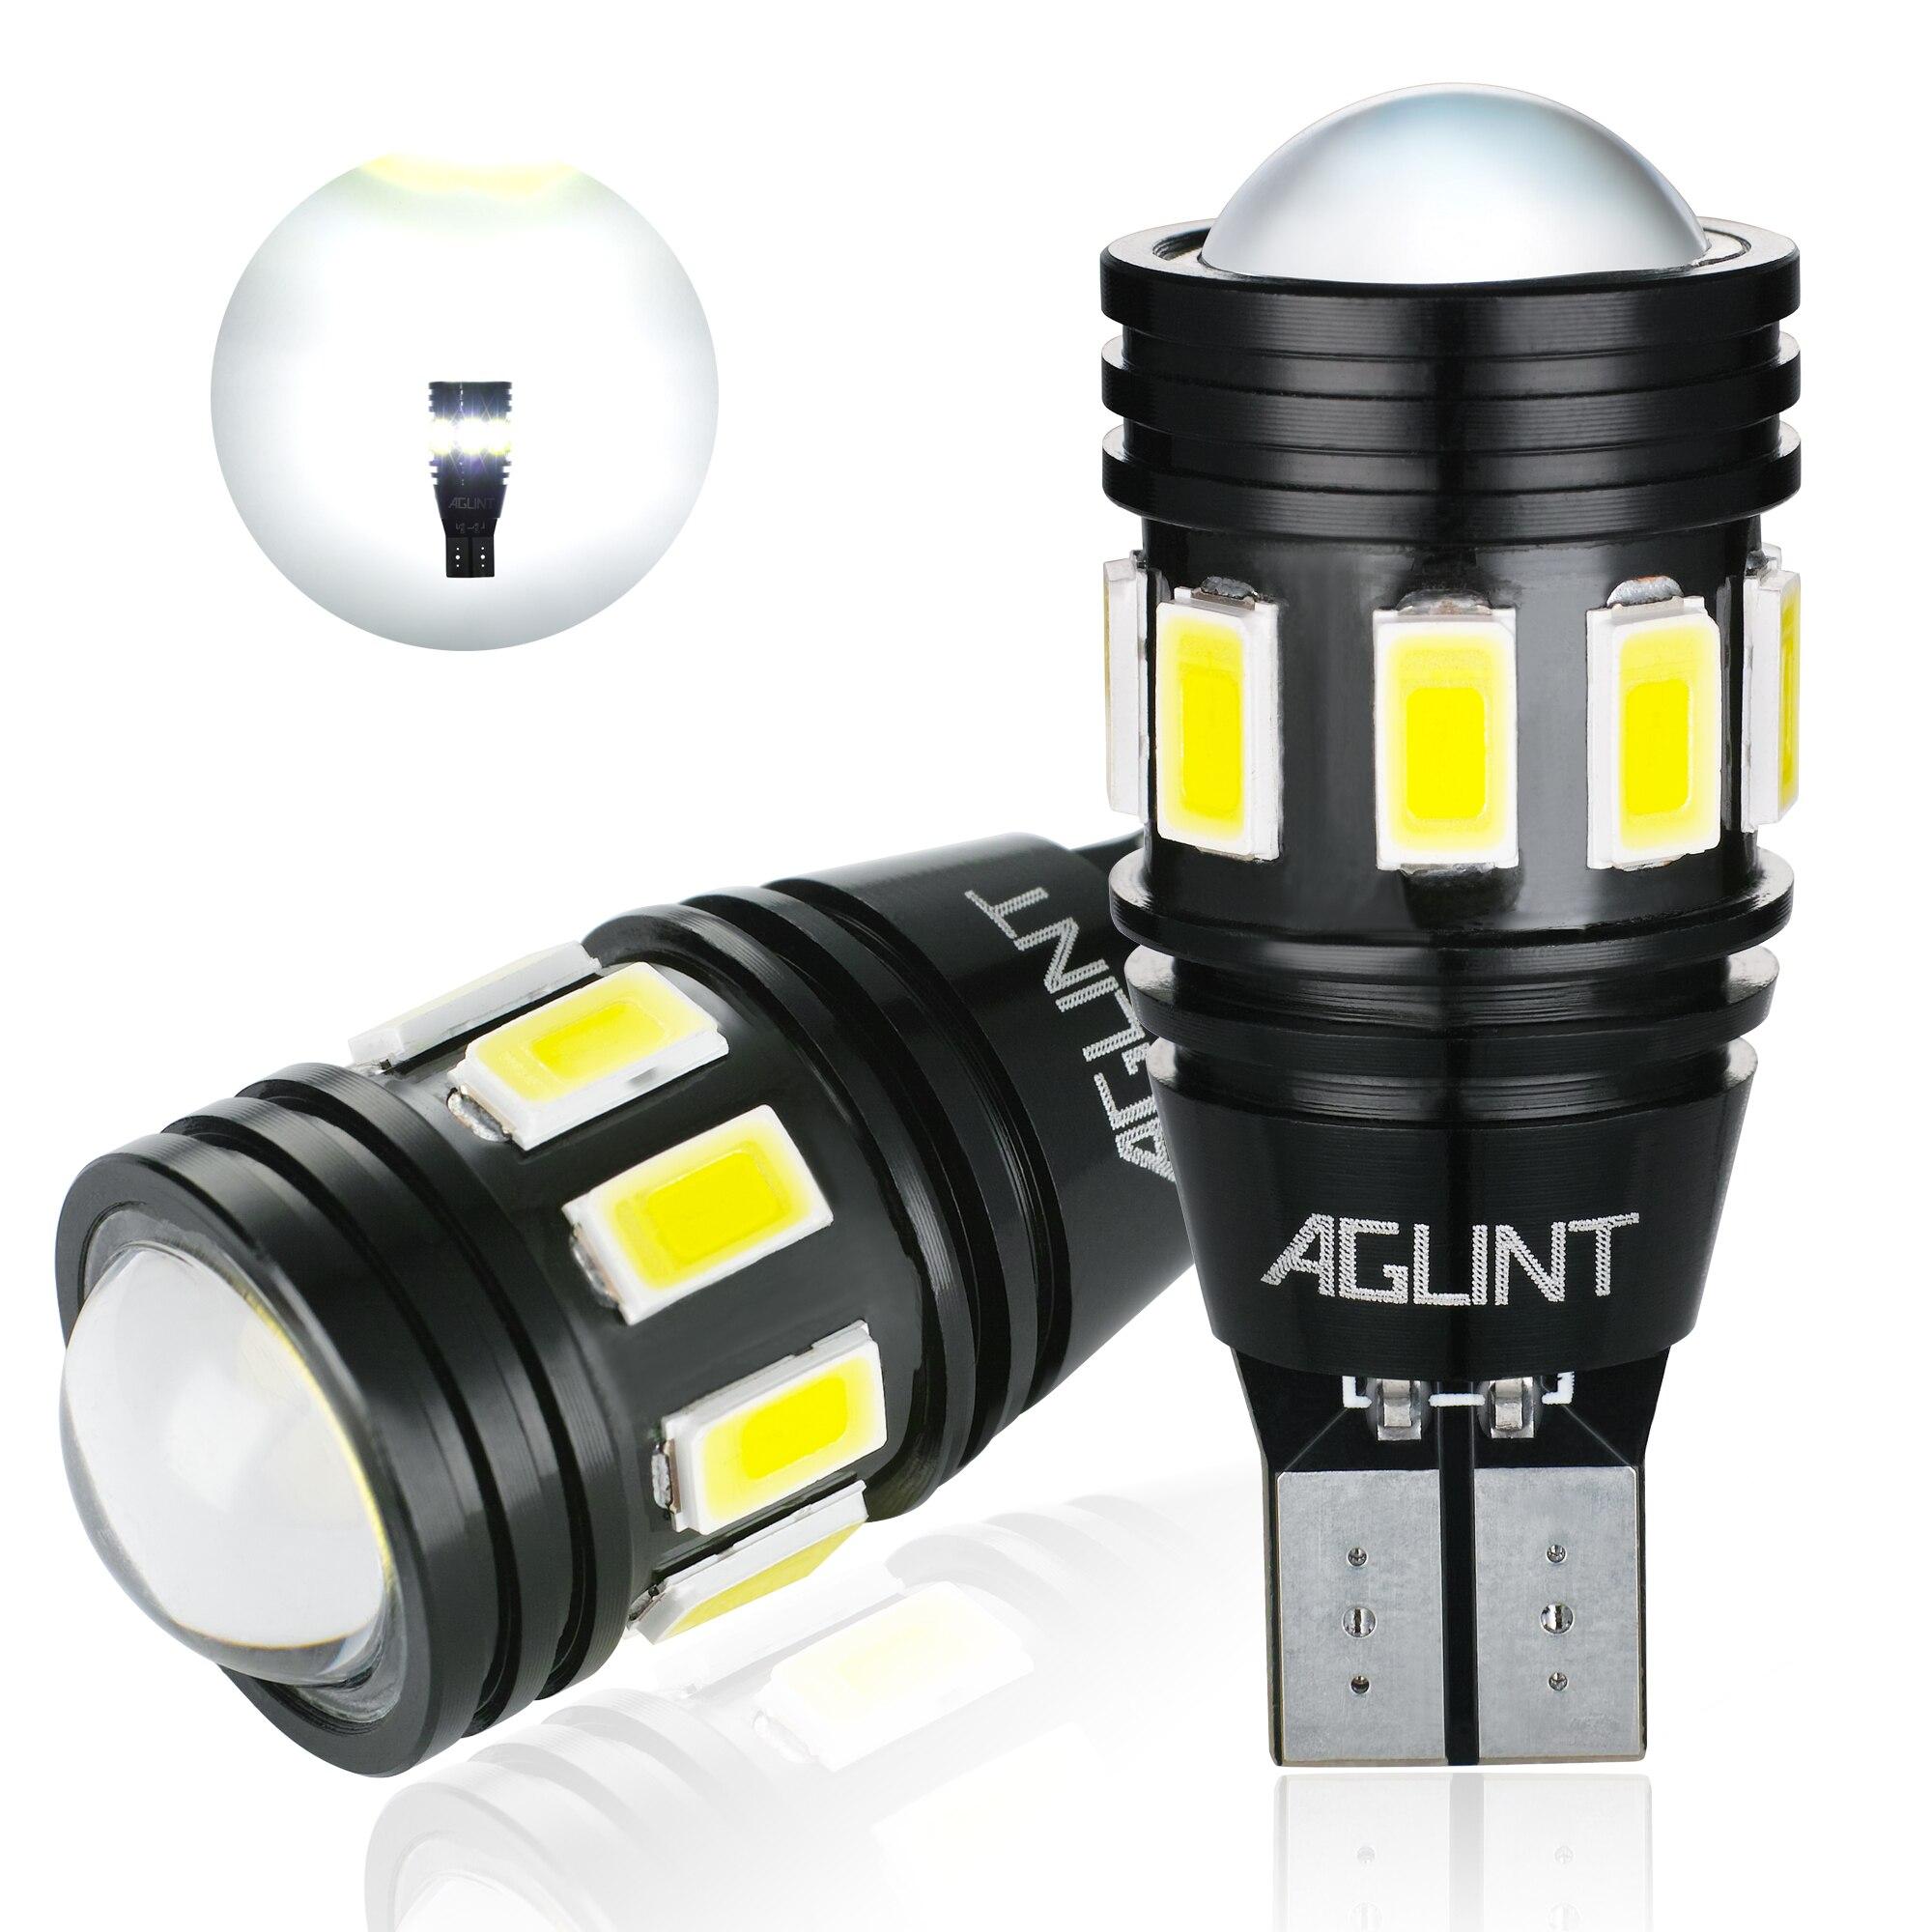 AGLINT 2 шт. T15 W16W 912 921 светодиодный светильник CANBUS без ошибок светодиодный 5630 3030 SMD для автомобиля задний светильник задний фонарь светильник s б...